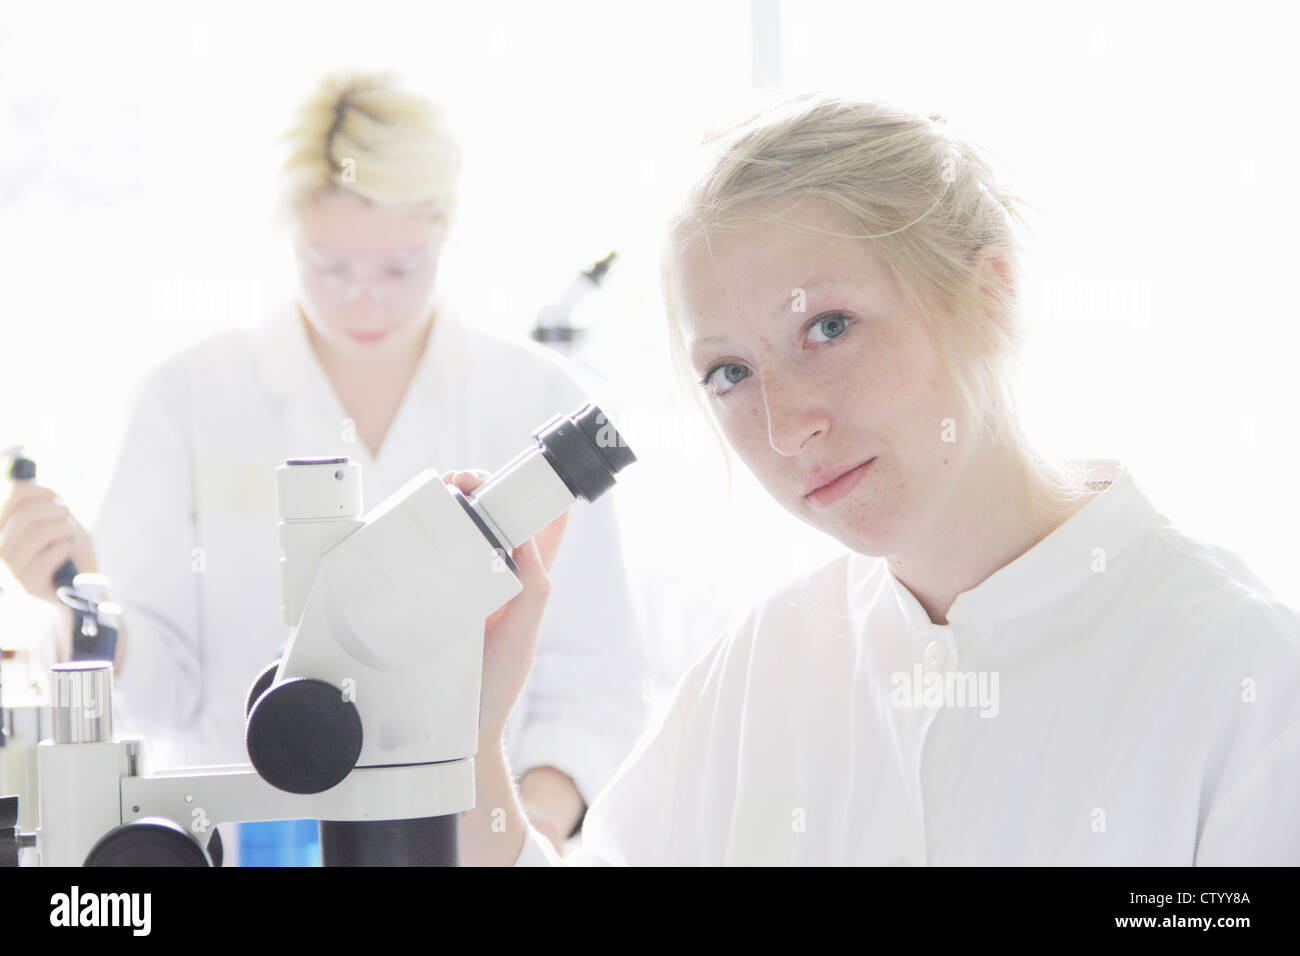 Wissenschaftler am Mikroskop im Labor Stockbild